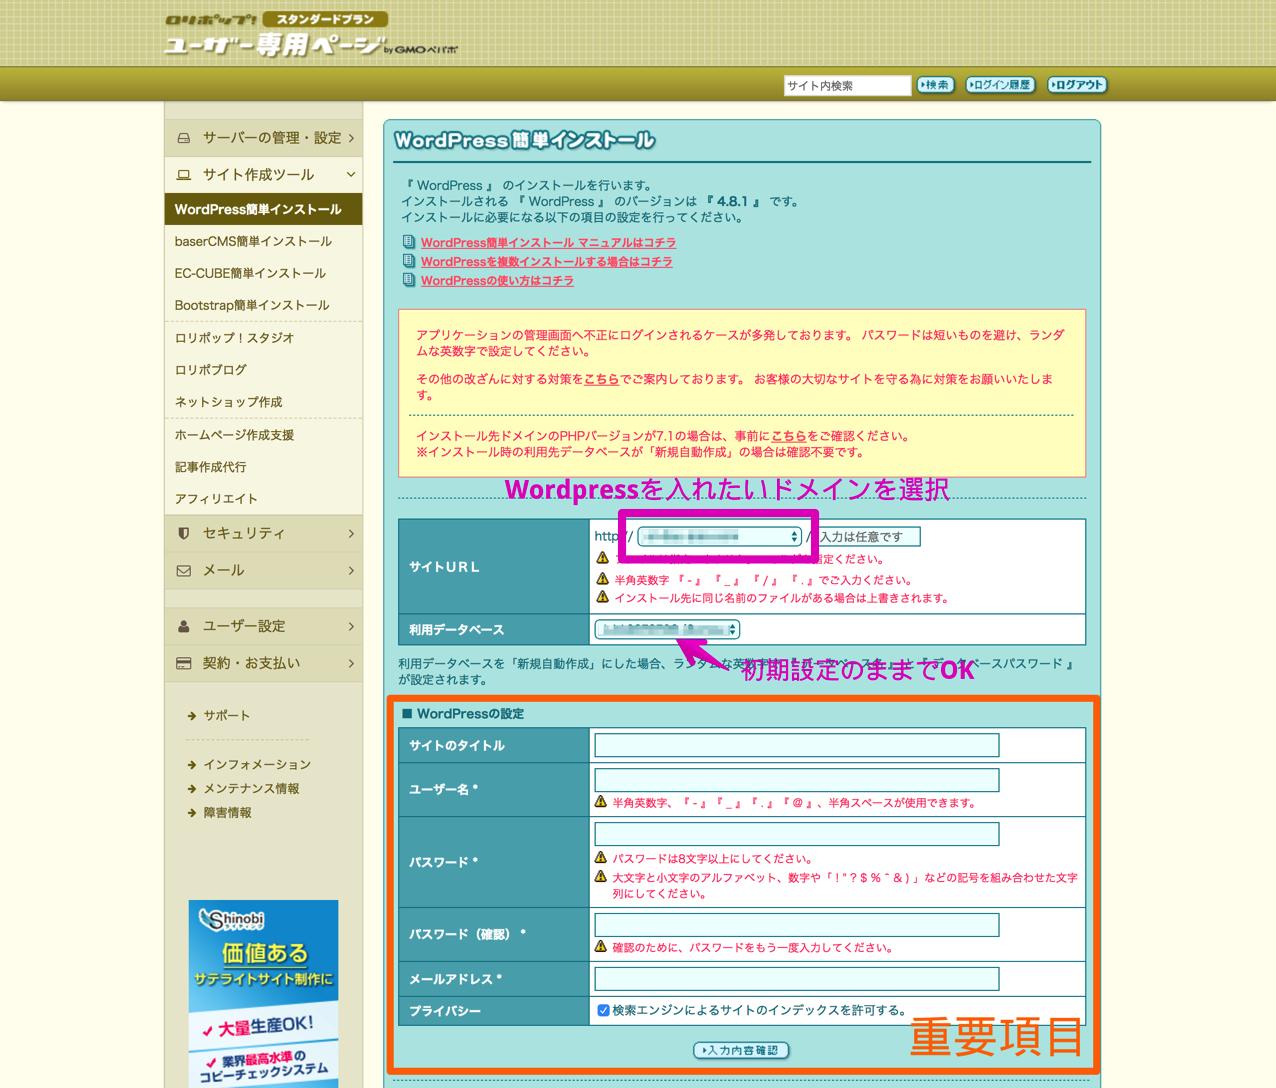 FireShot Capture 25  ロリポップ ユーザー専用ページ  WordPress簡単インストール  https user lolipop jp